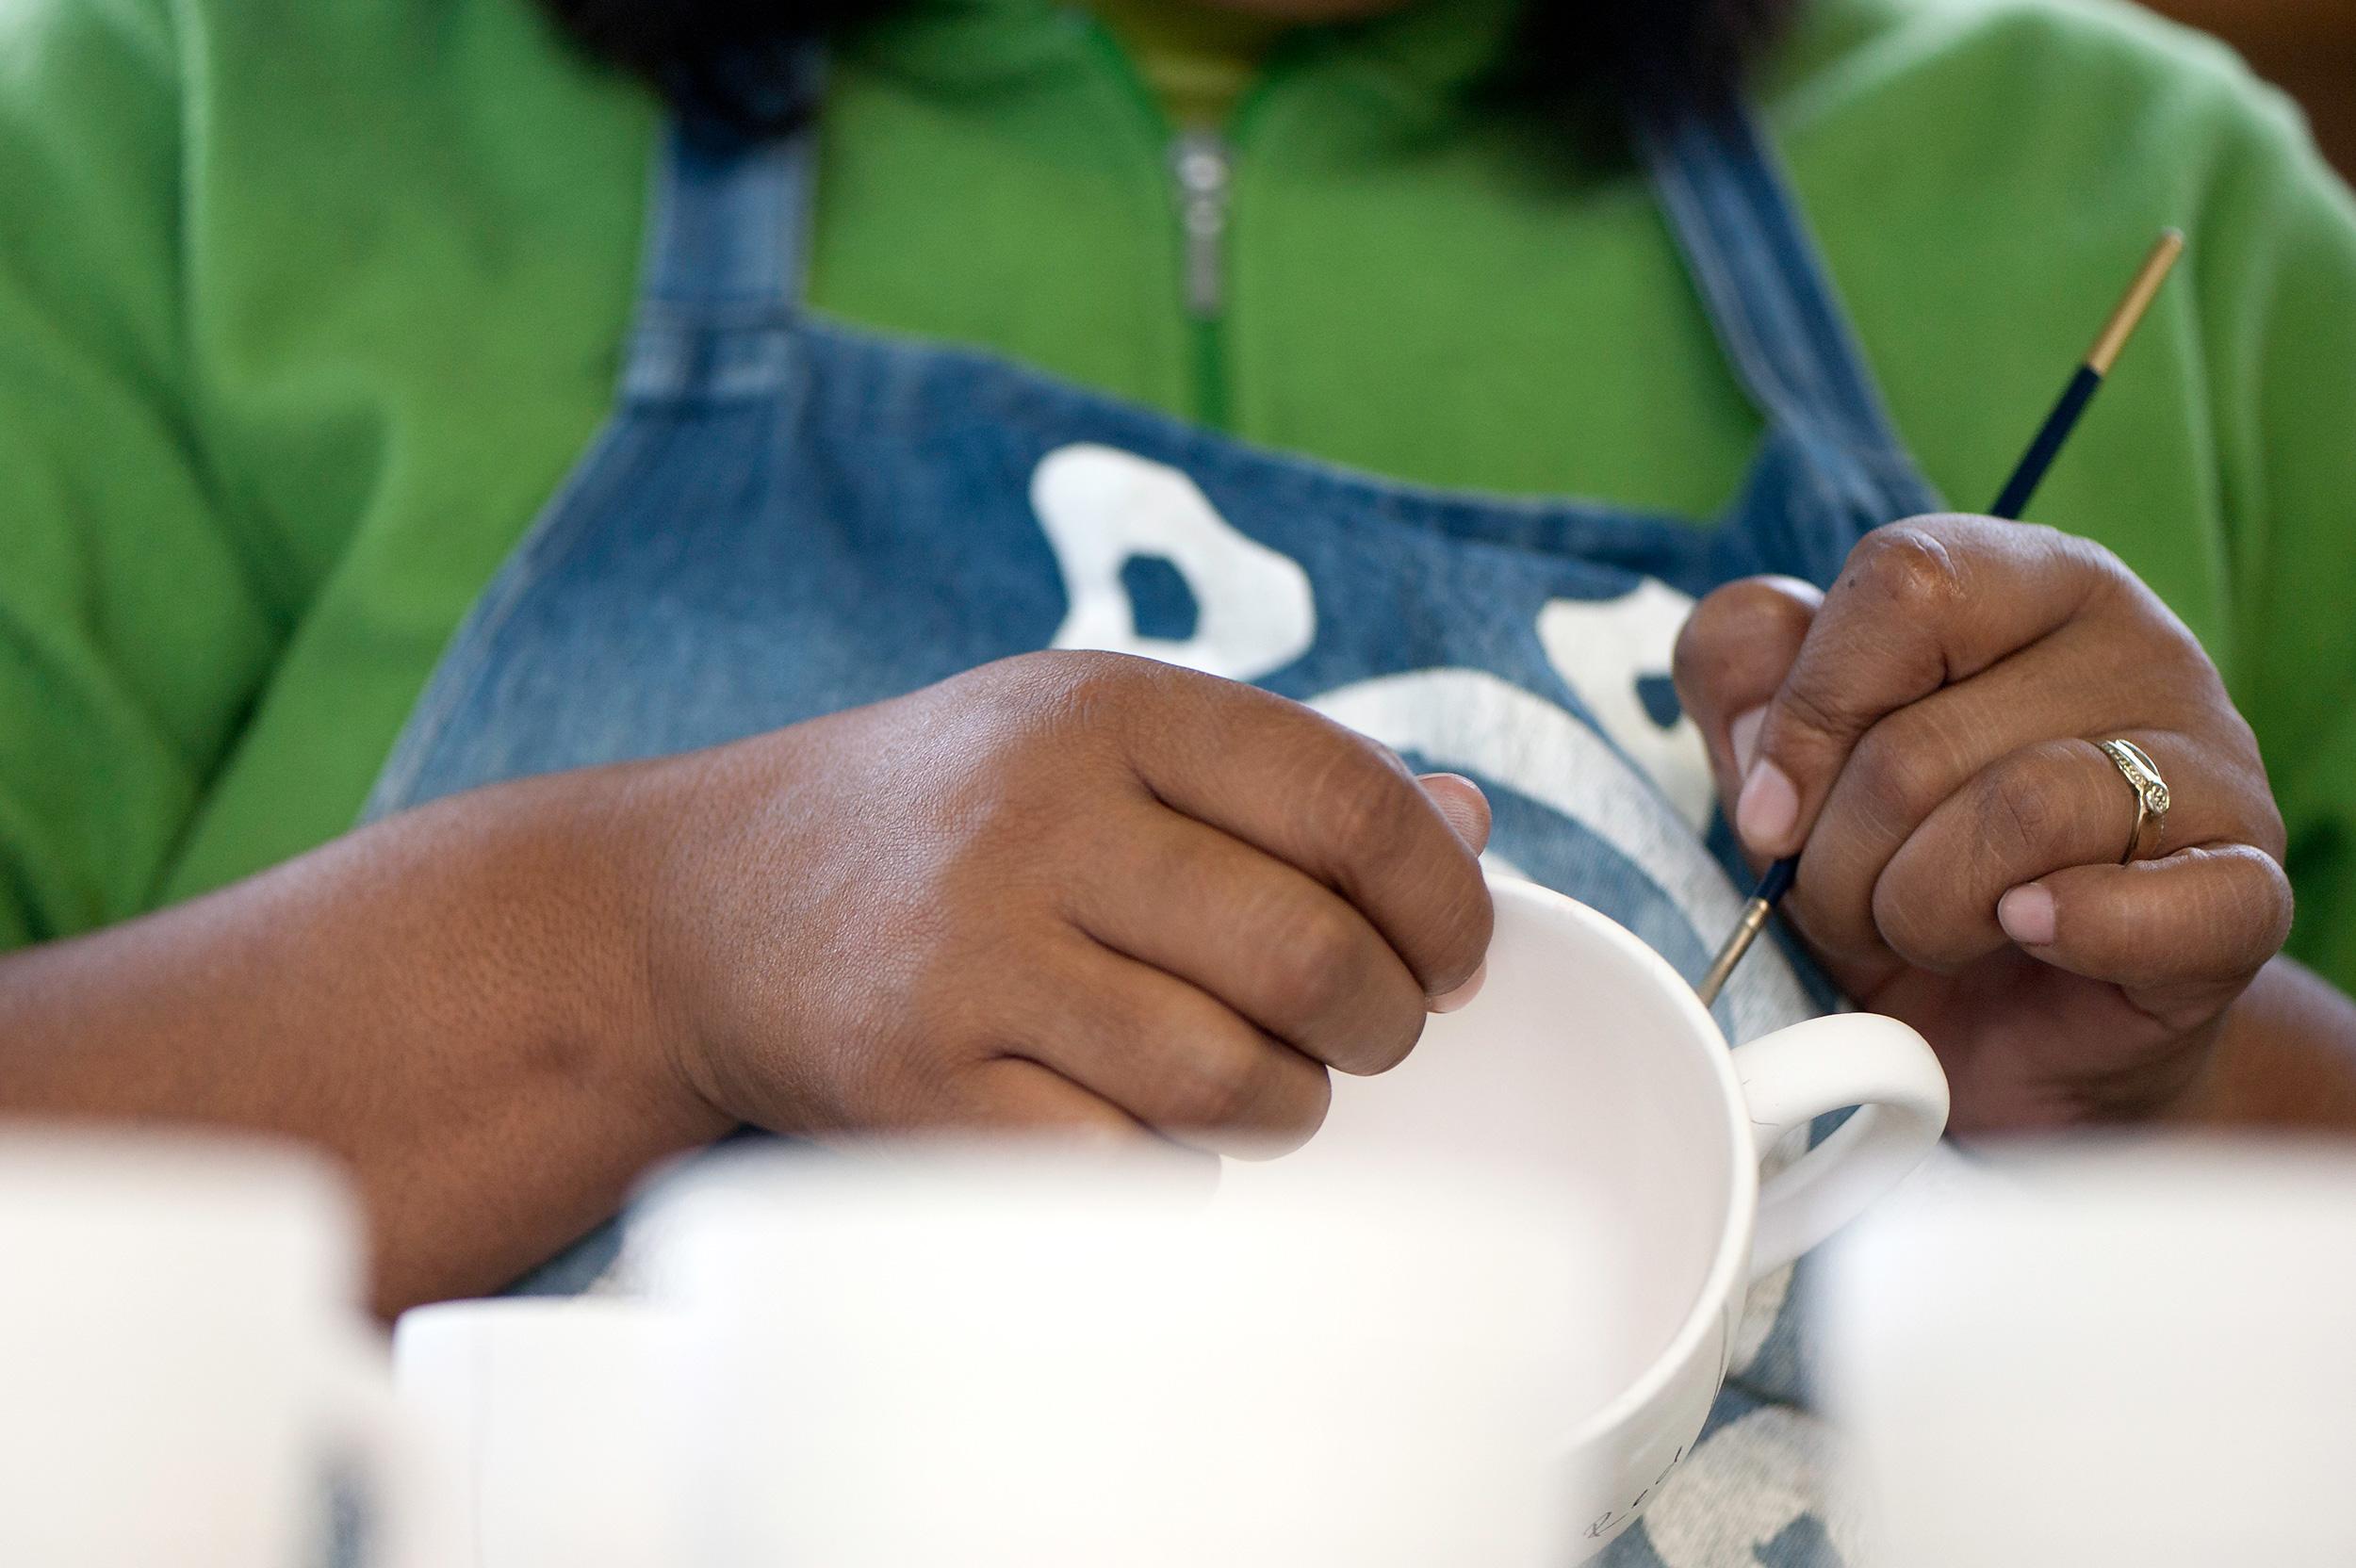 kapula-handmade-hand-painted-ceramics-design-marking.jpg